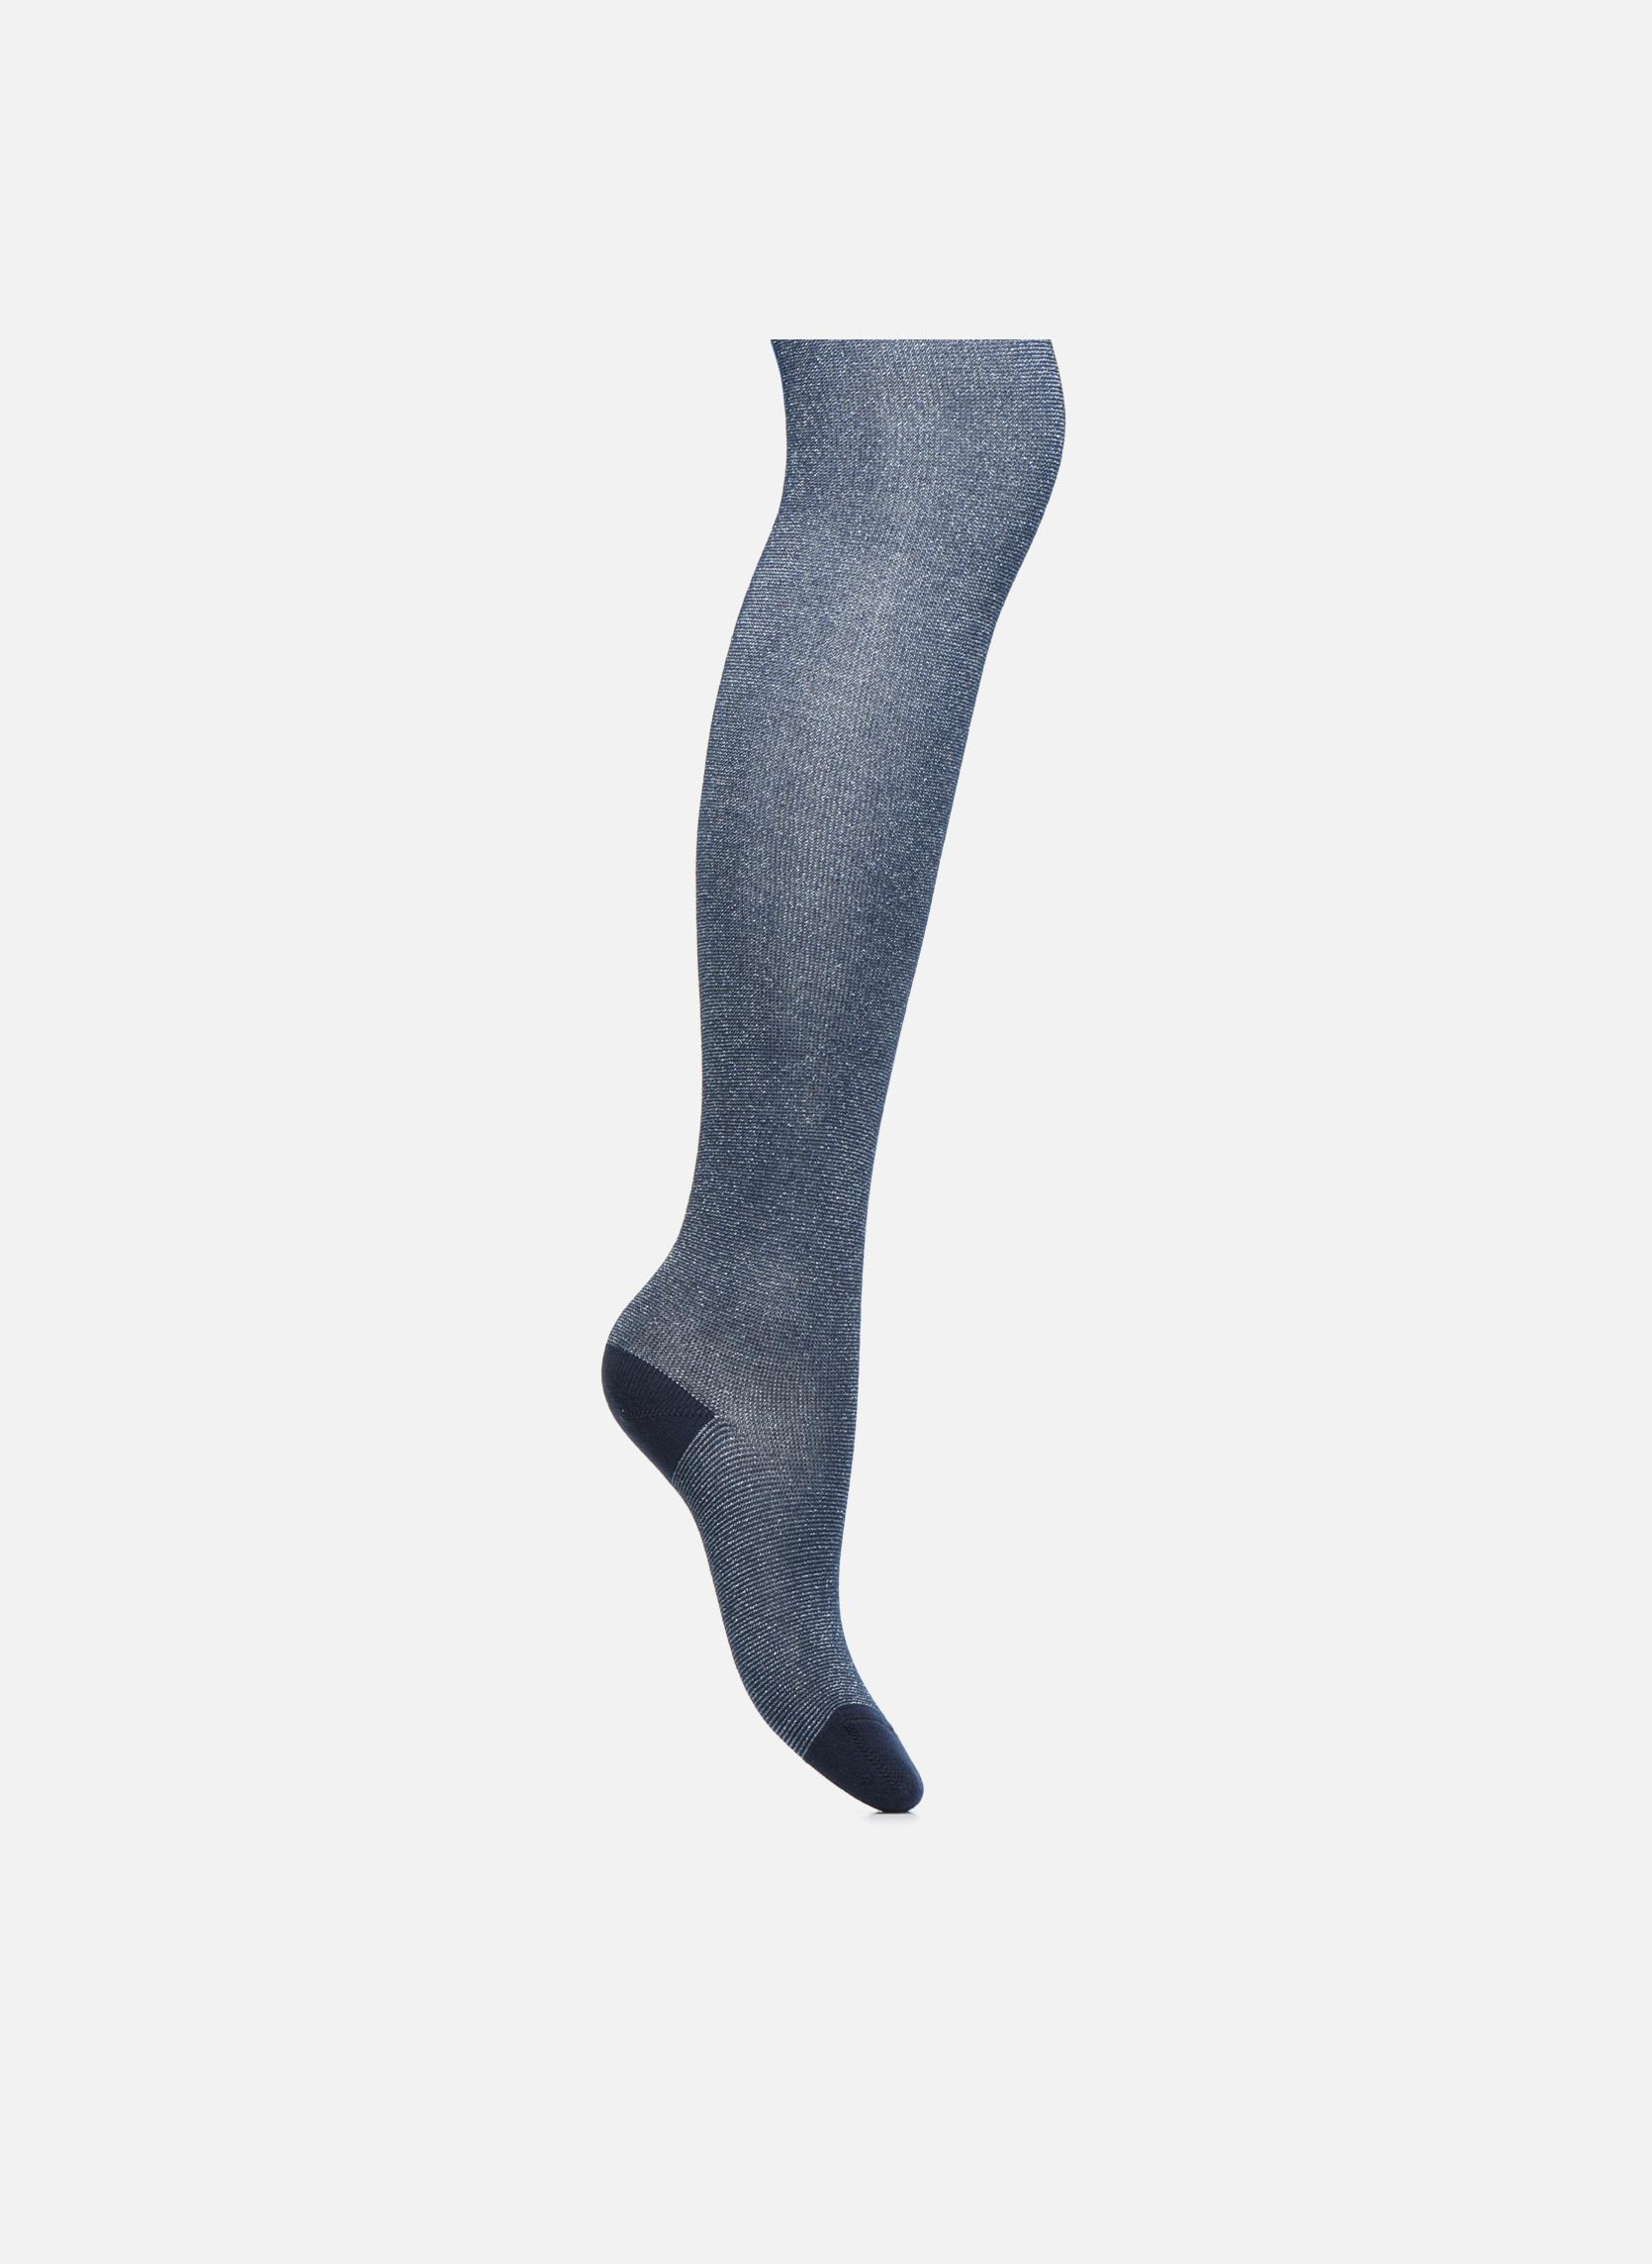 Panty GLITTER 044 - bleu